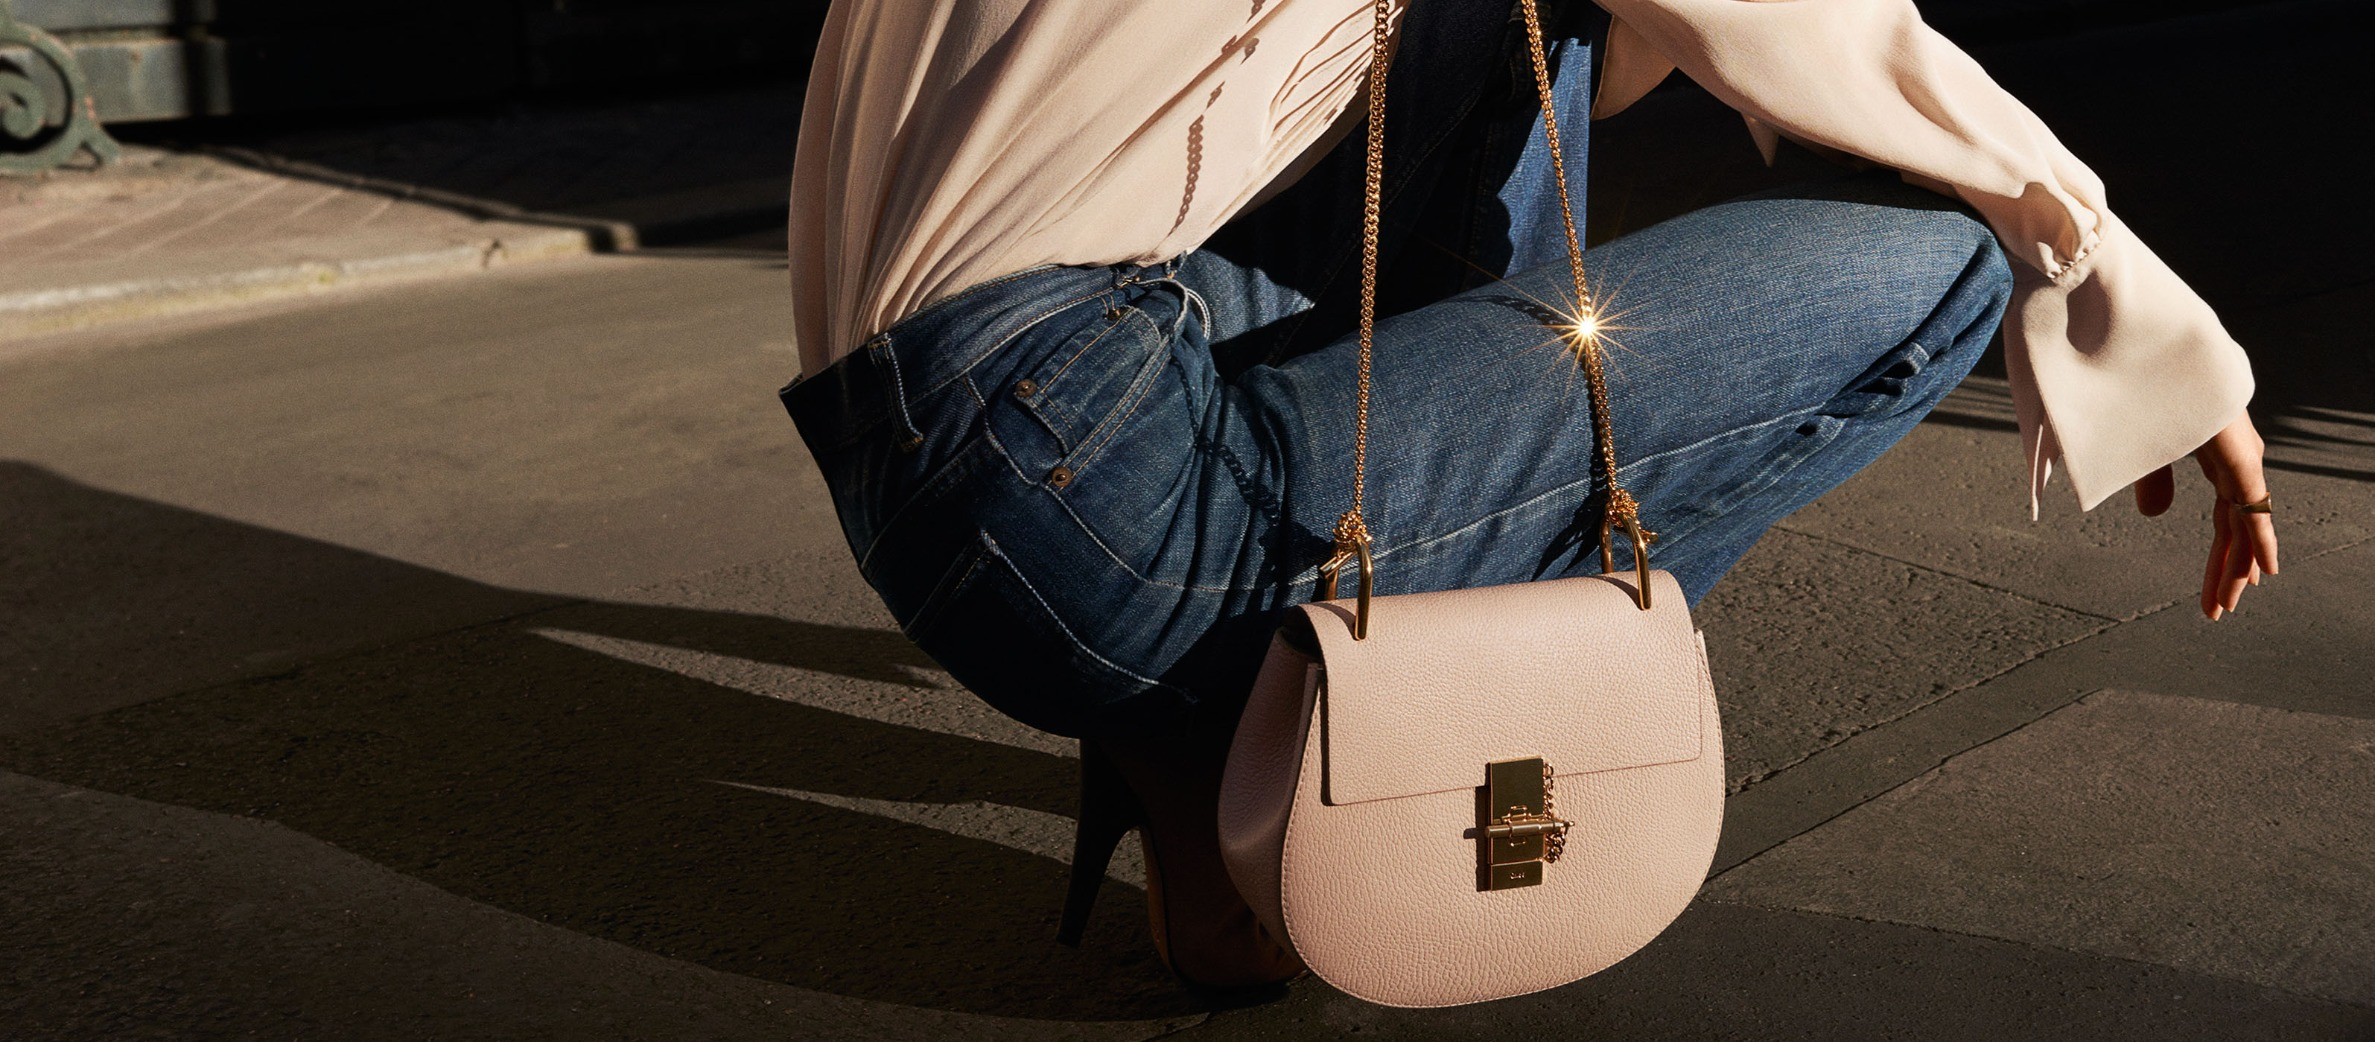 Chloe French Fashion House - The Dubai Mall